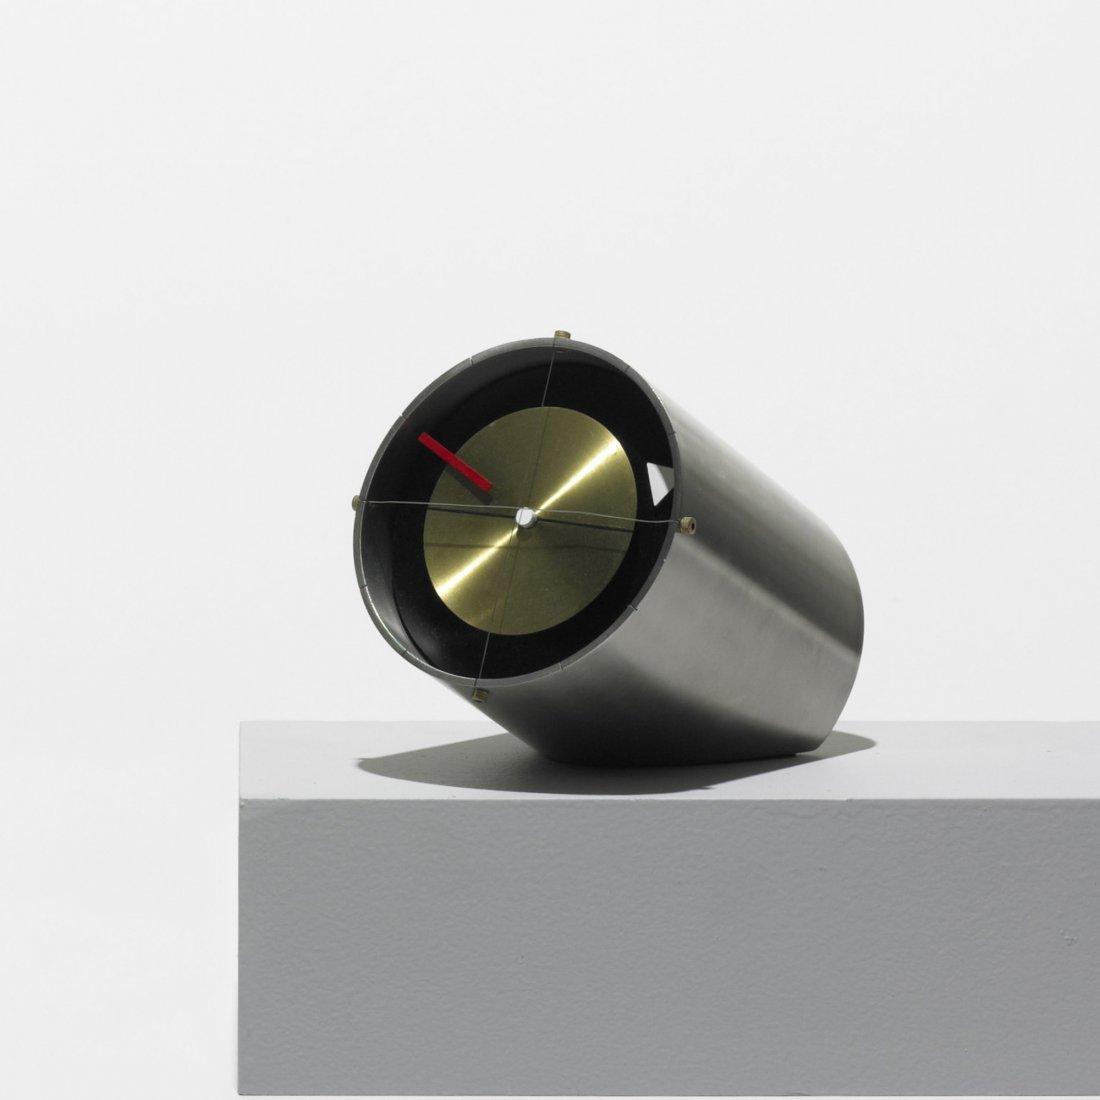 107: Nelson & Associates Clocknik table clock